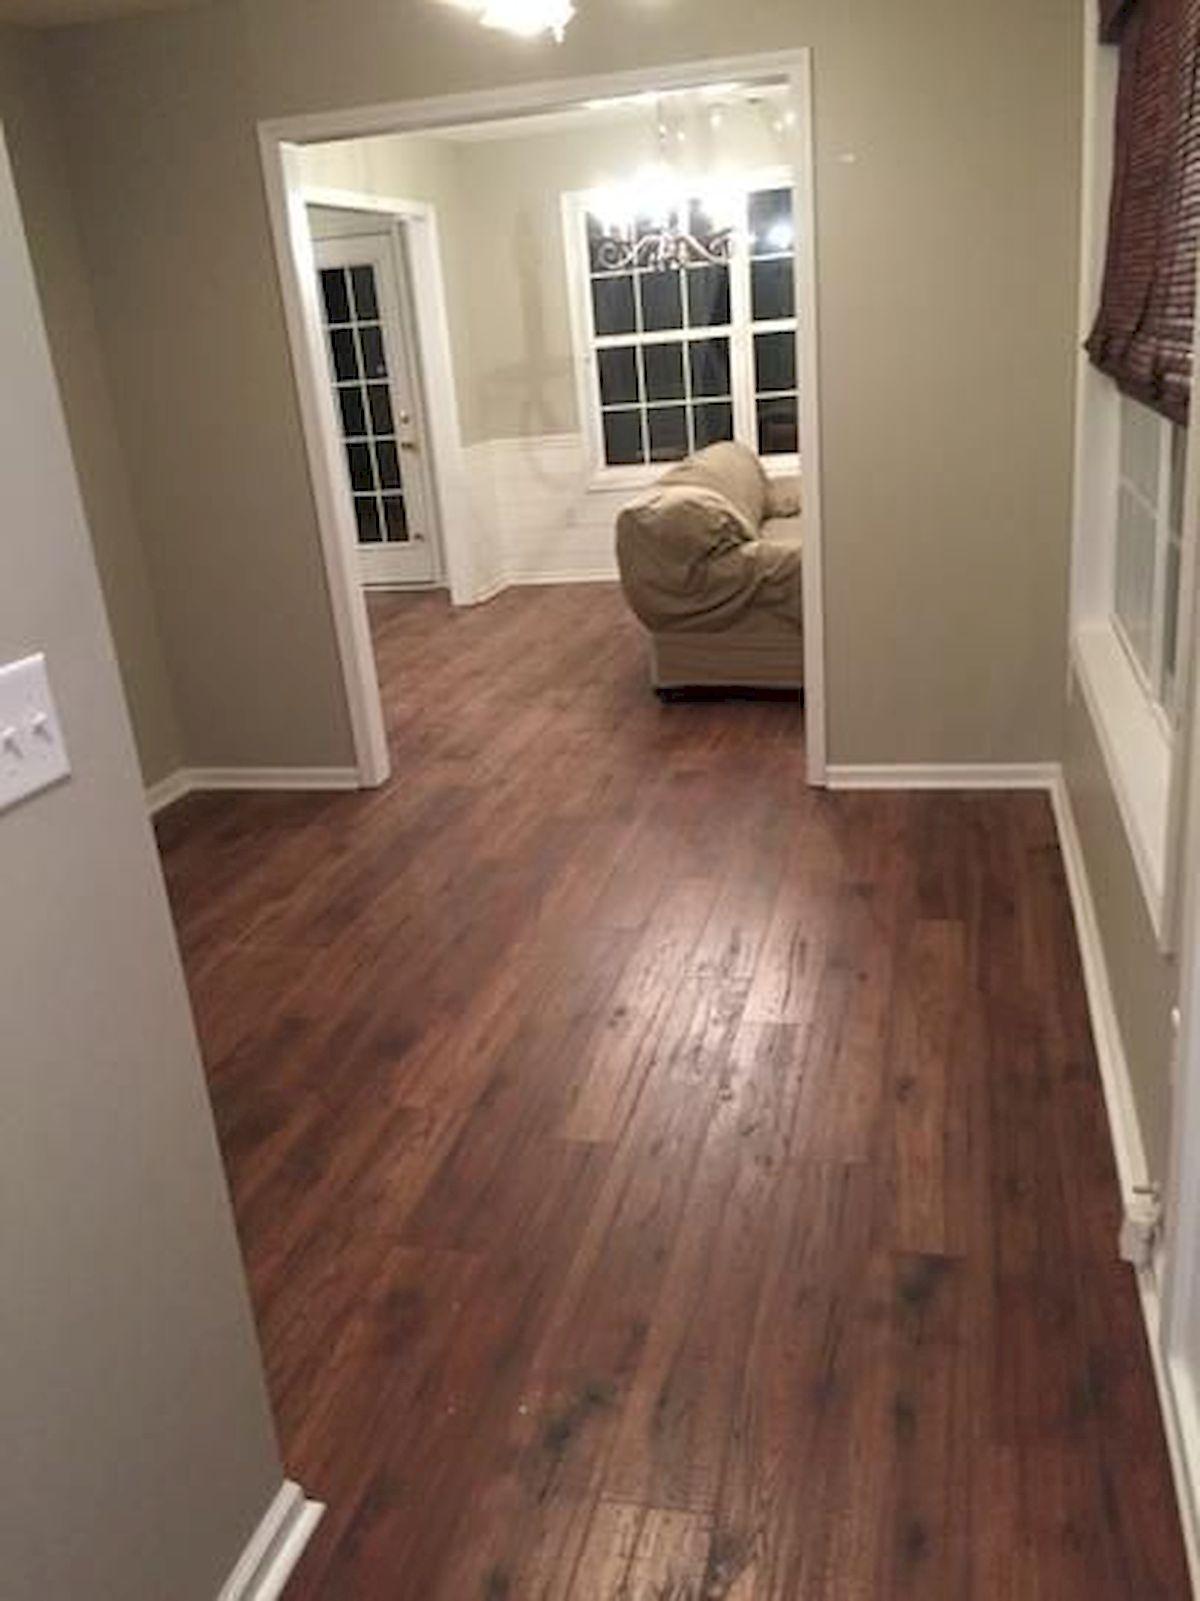 80 Gorgeous Hardwood Floor Ideas for Interior Home (72)